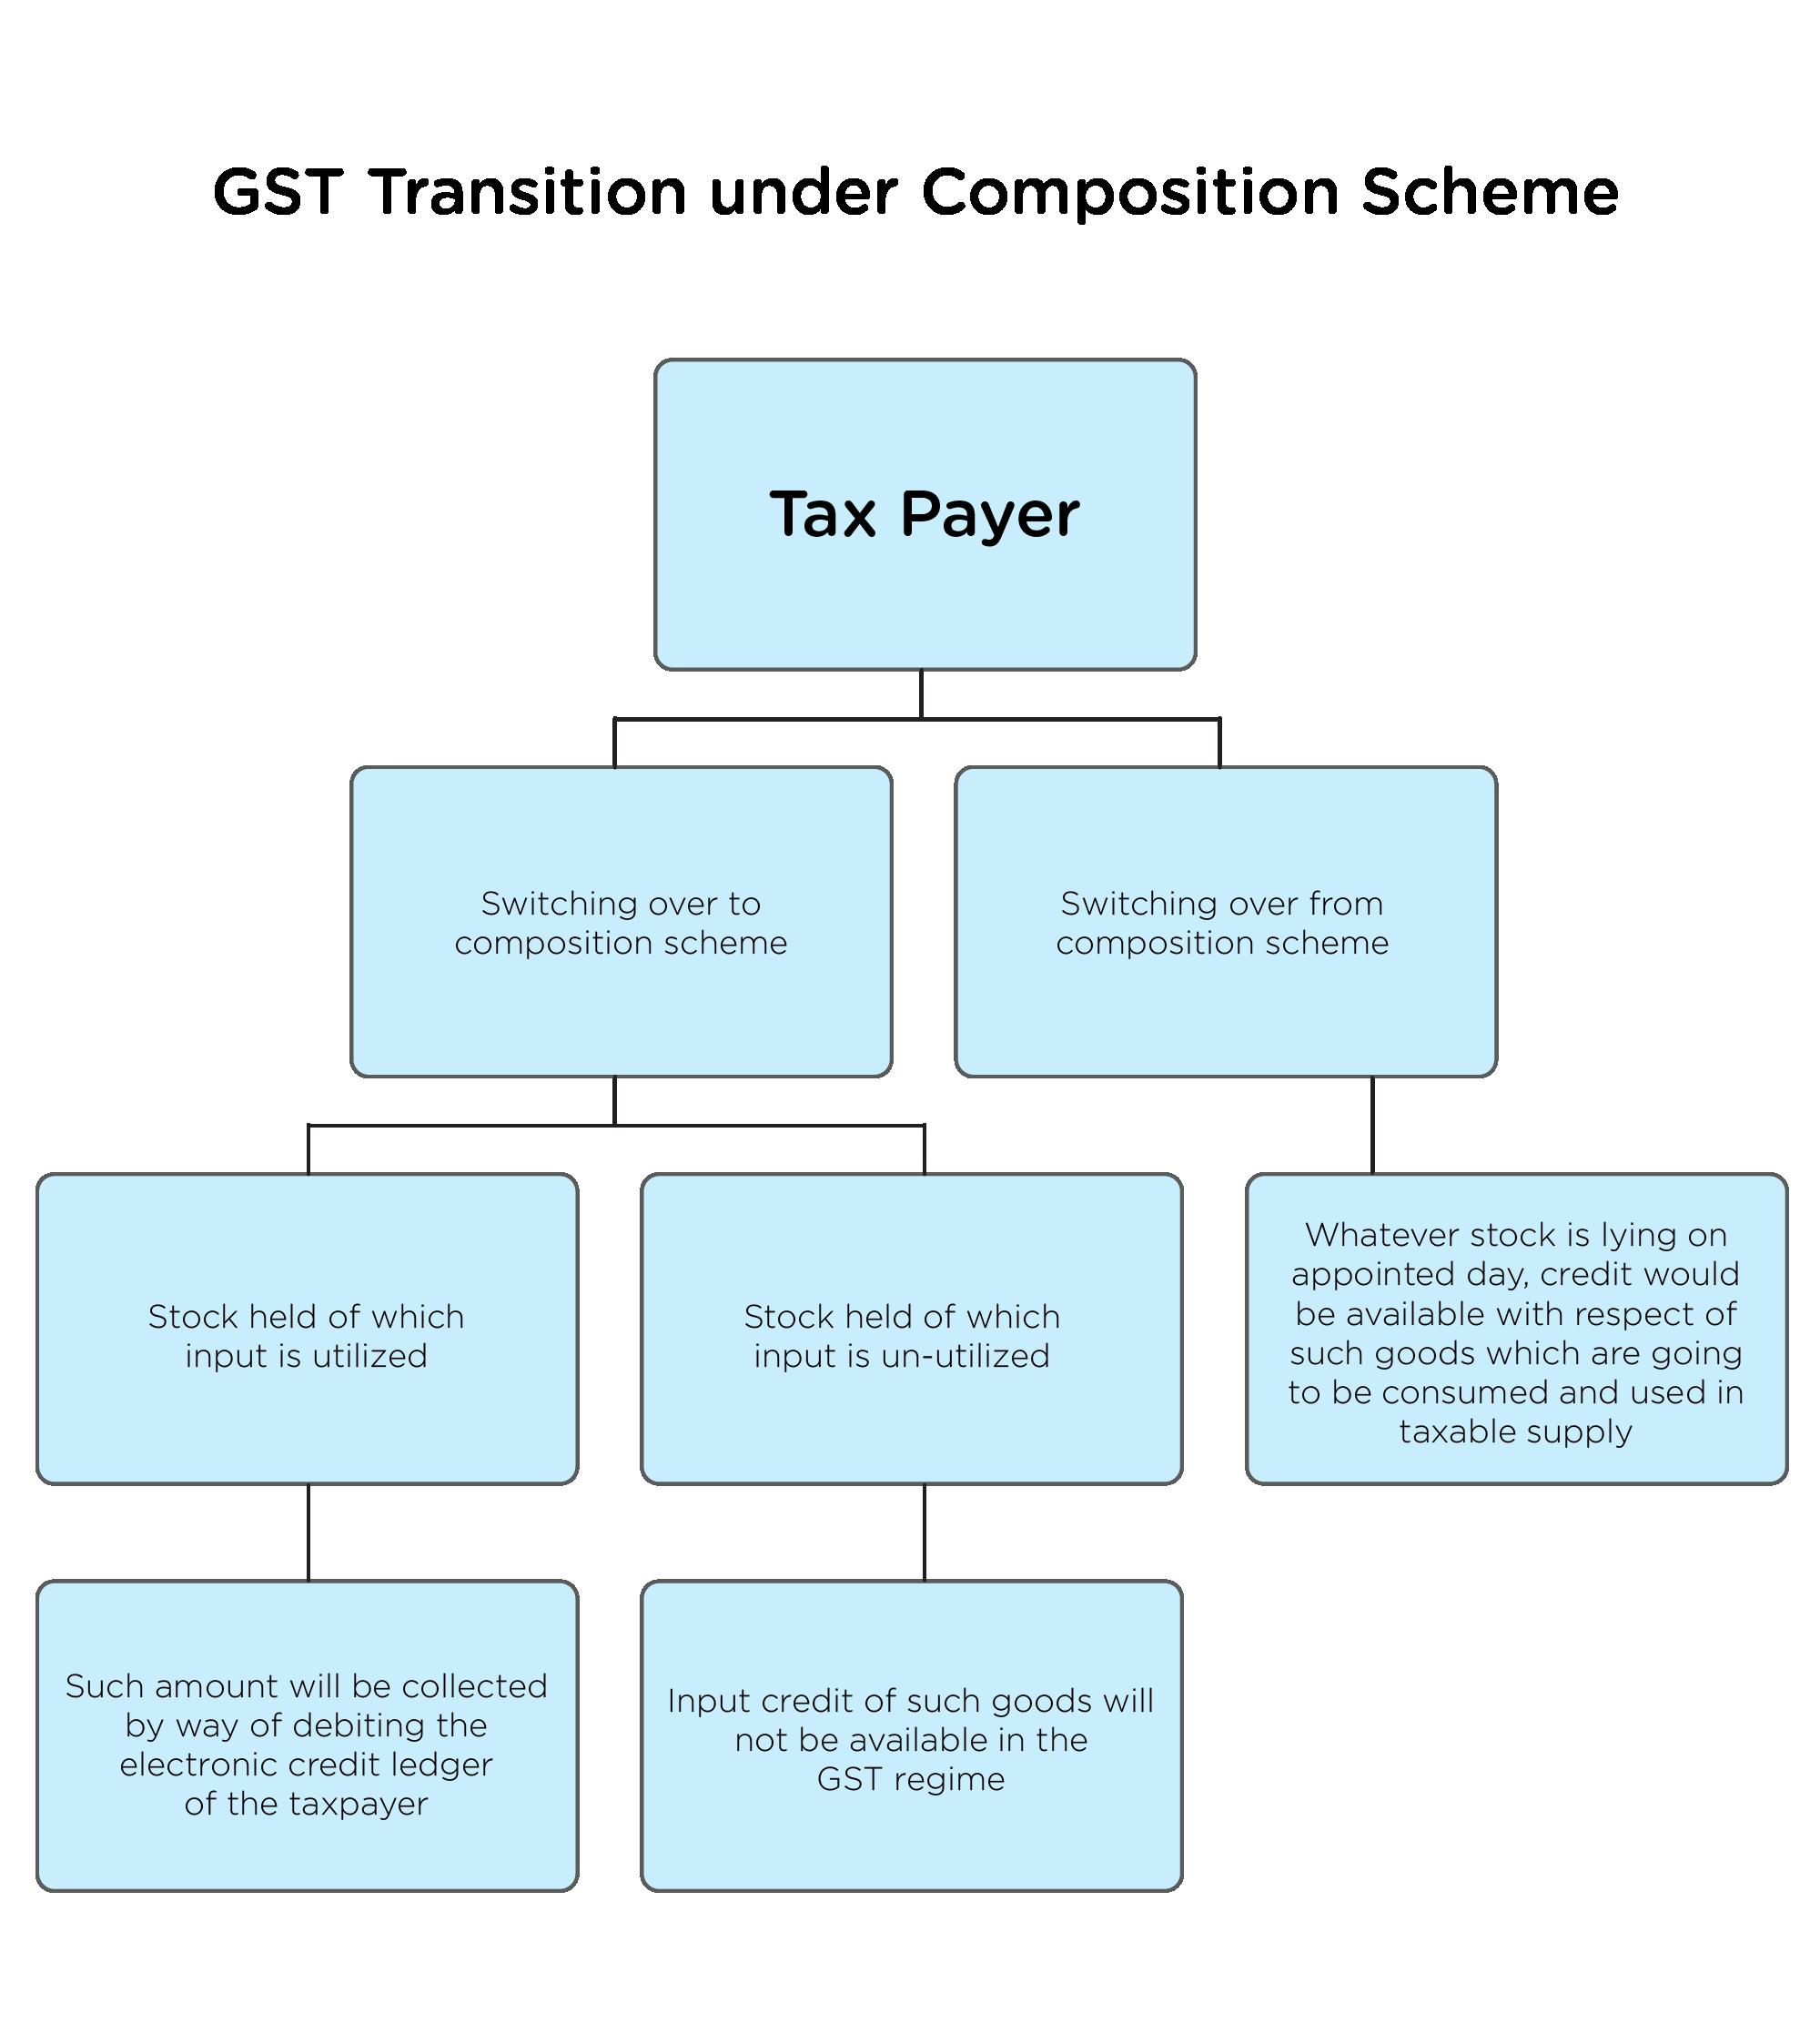 GST transition process